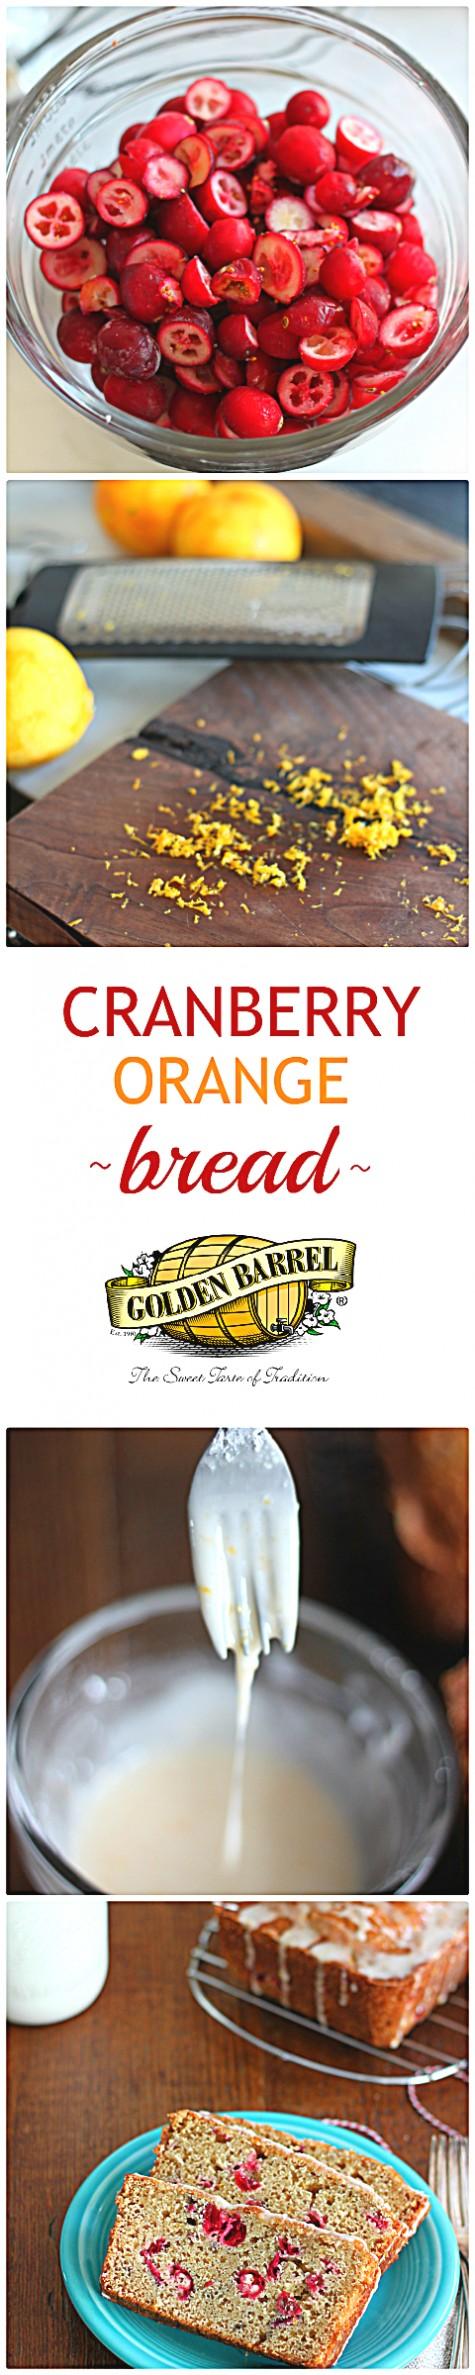 Cranberry Orange Bread with Orange Glaze - Golden Barrel